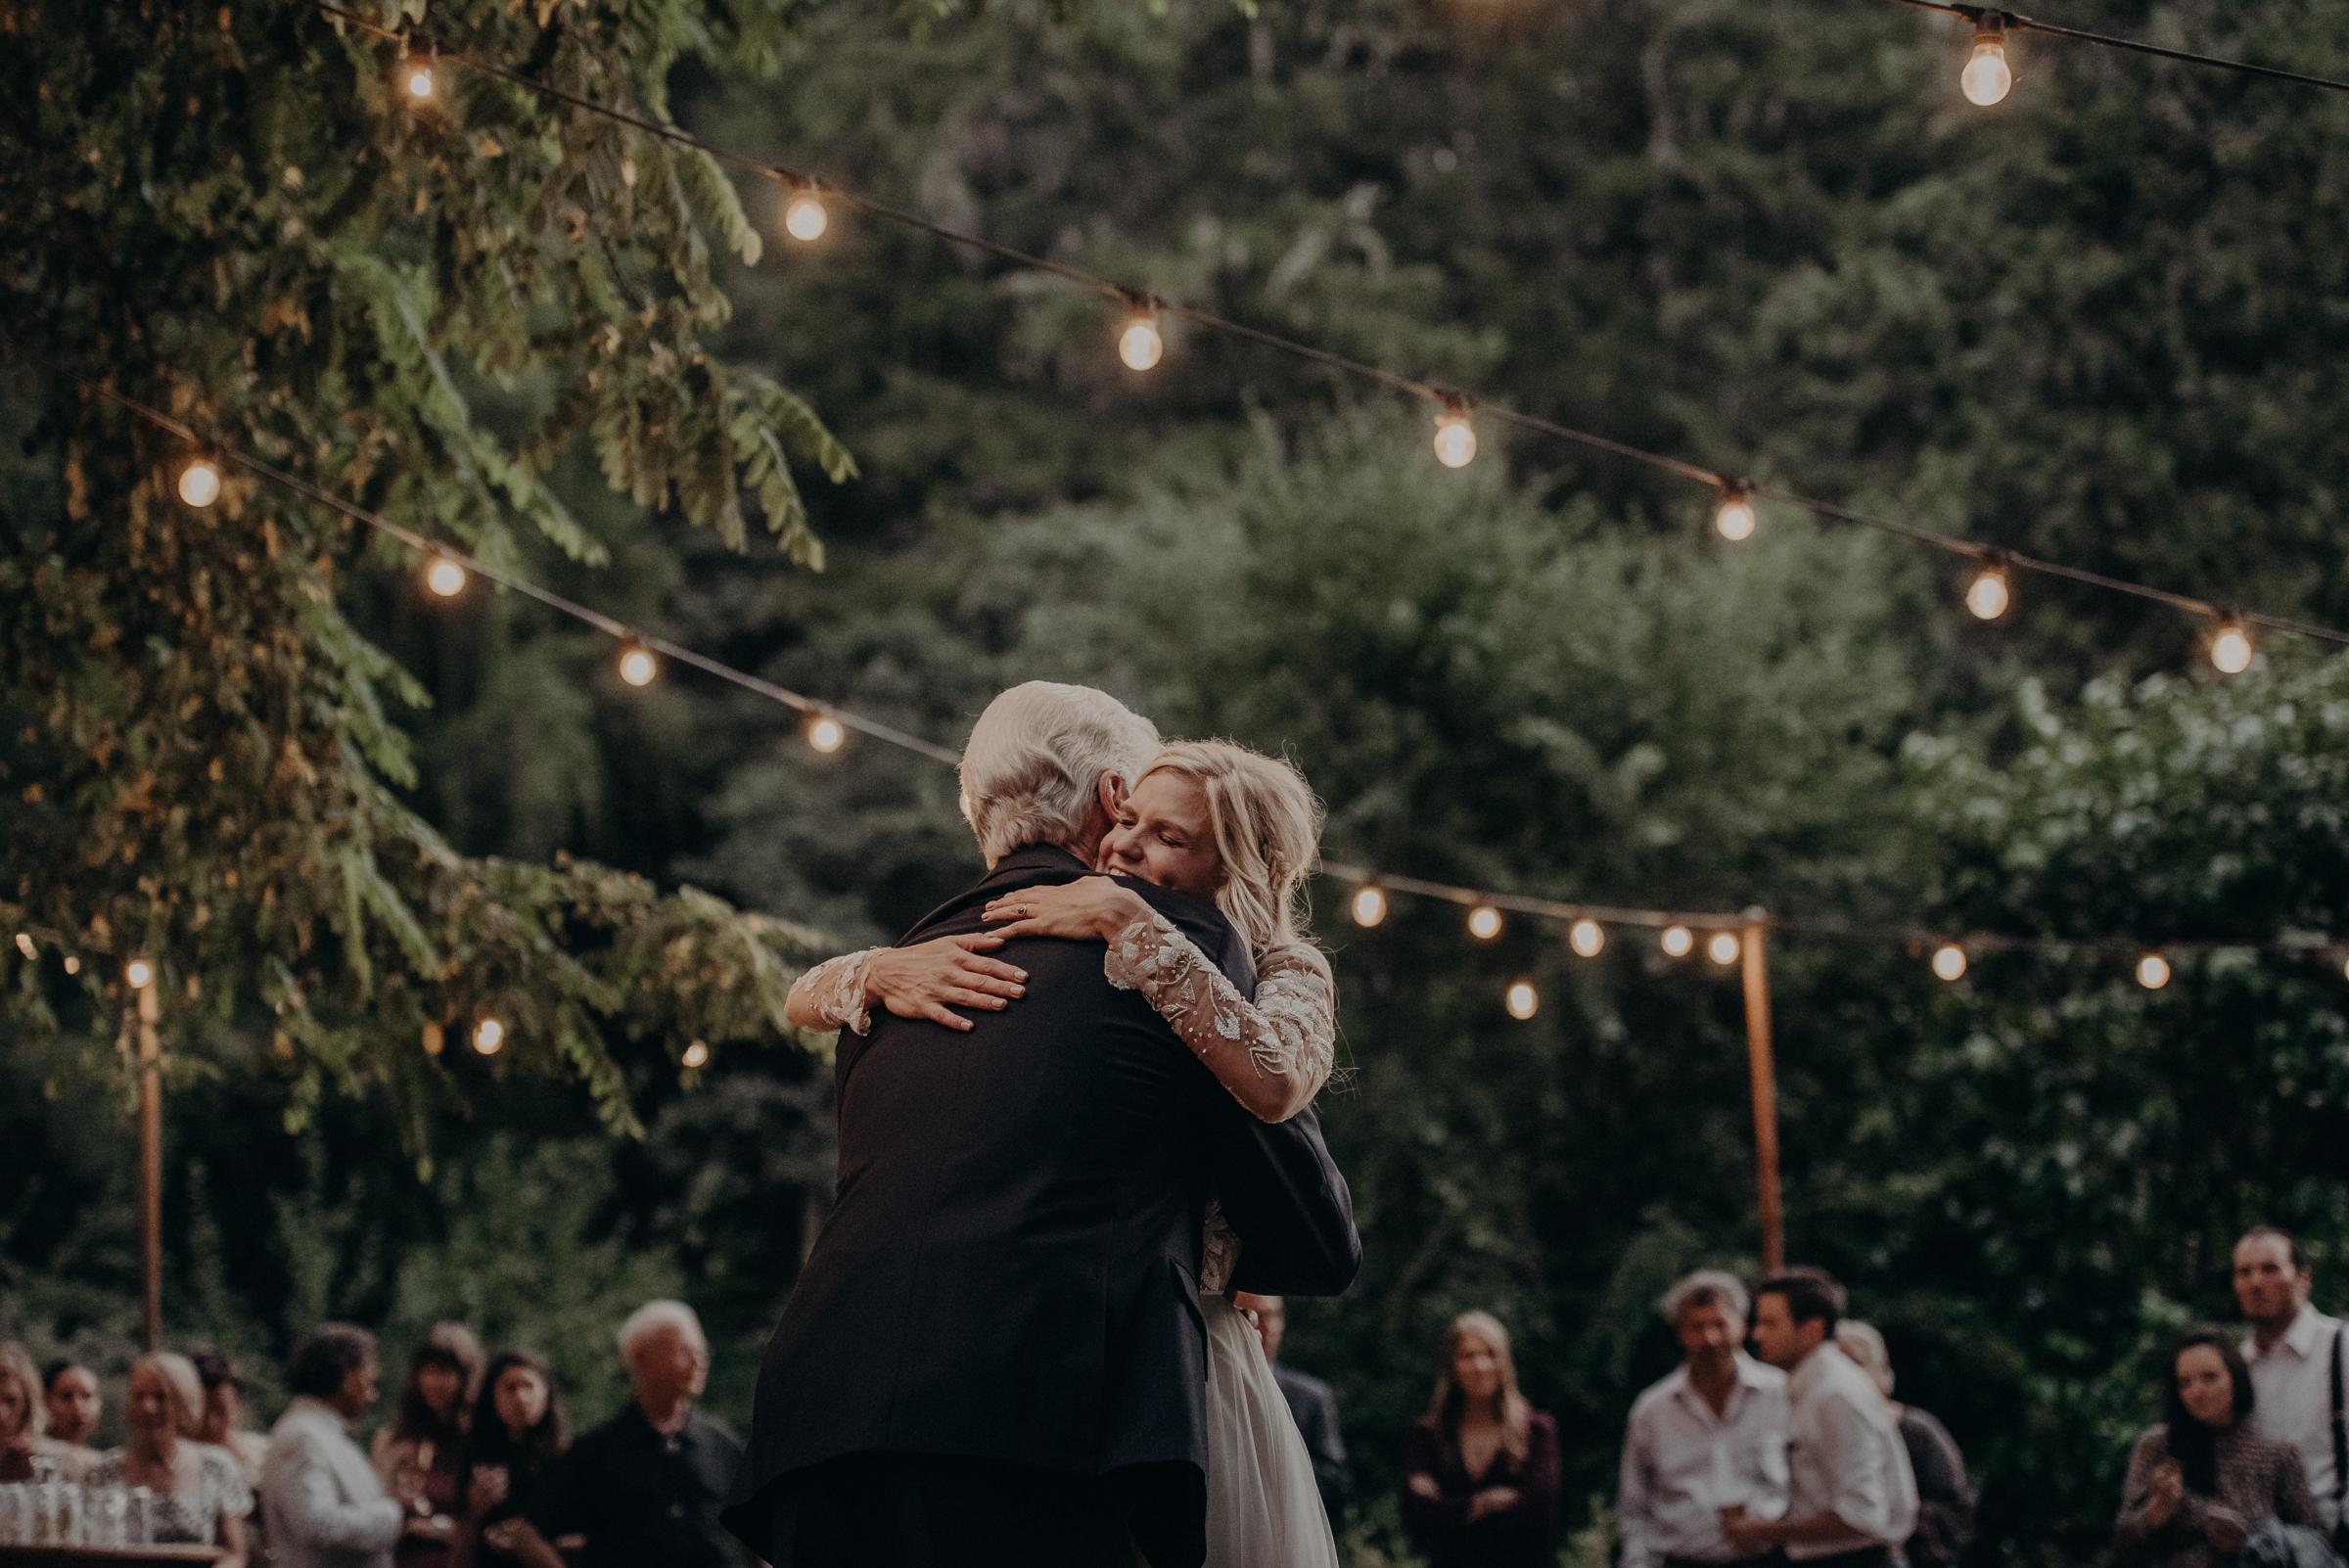 IsaiahAndTaylor.com - California Destination Elopement, Lake Leonard Reserve Wedding, Ukiah-203.jpg